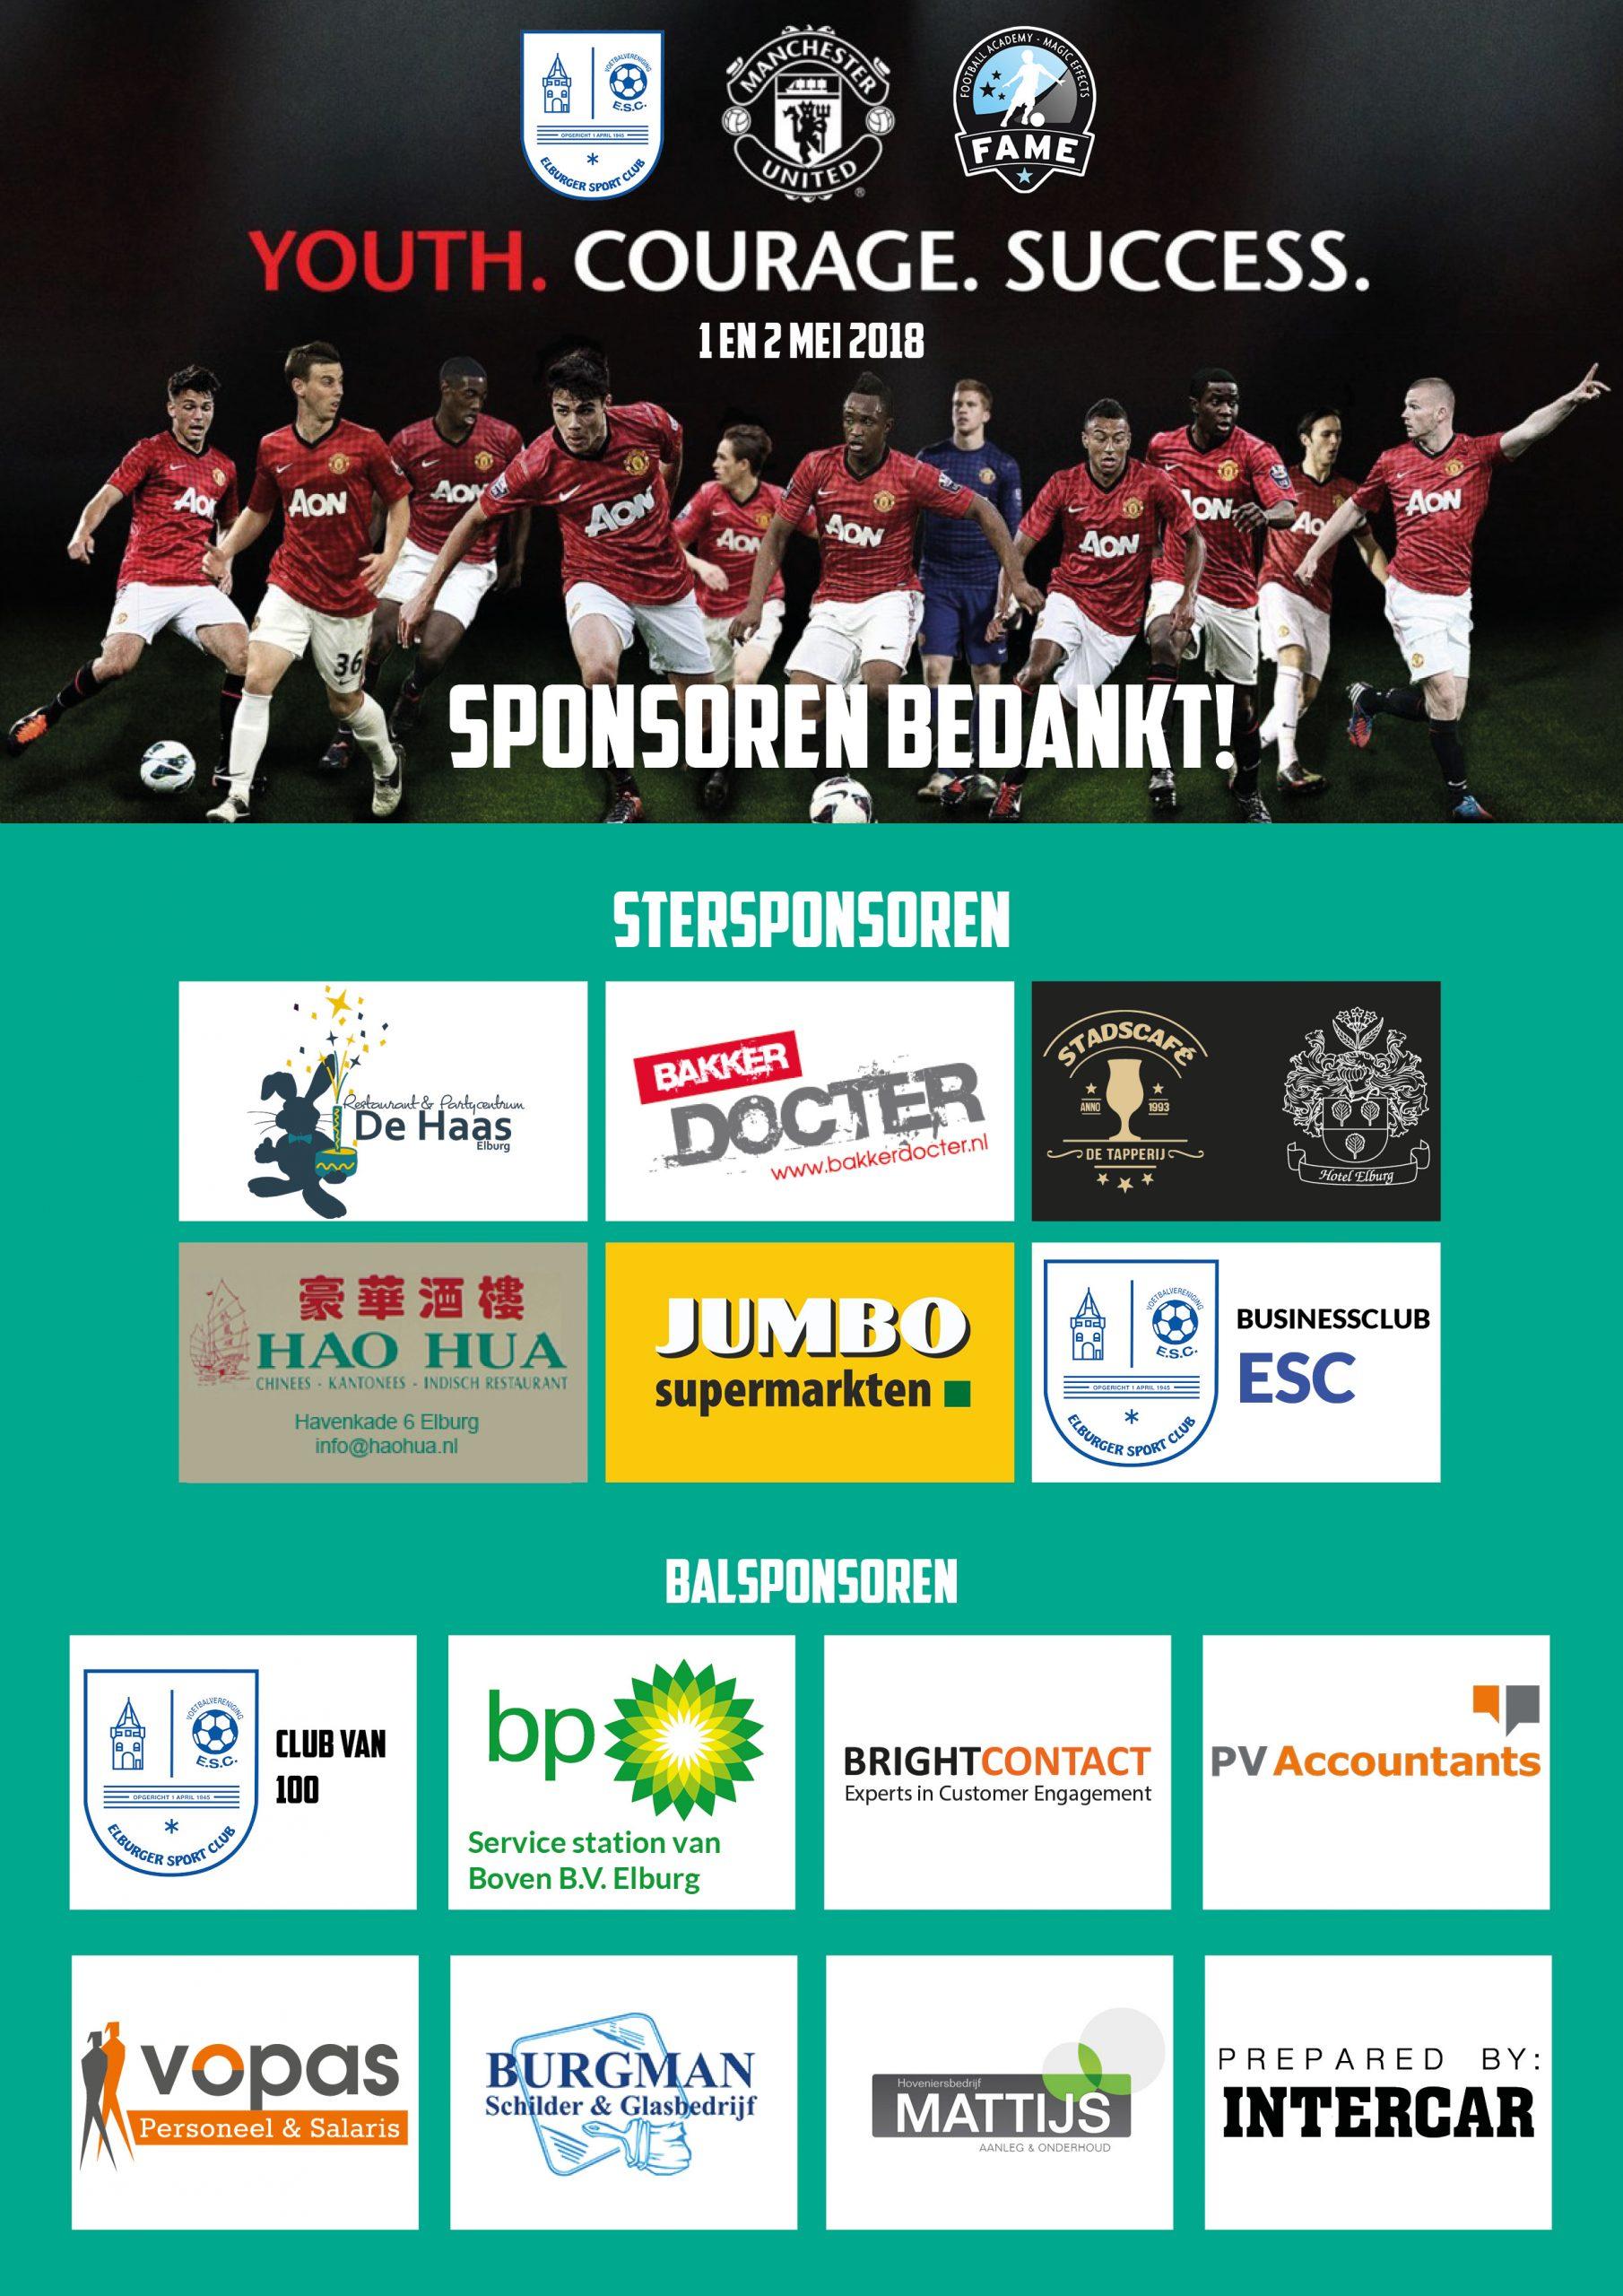 Sponsoren bedankt! - Elburger SC